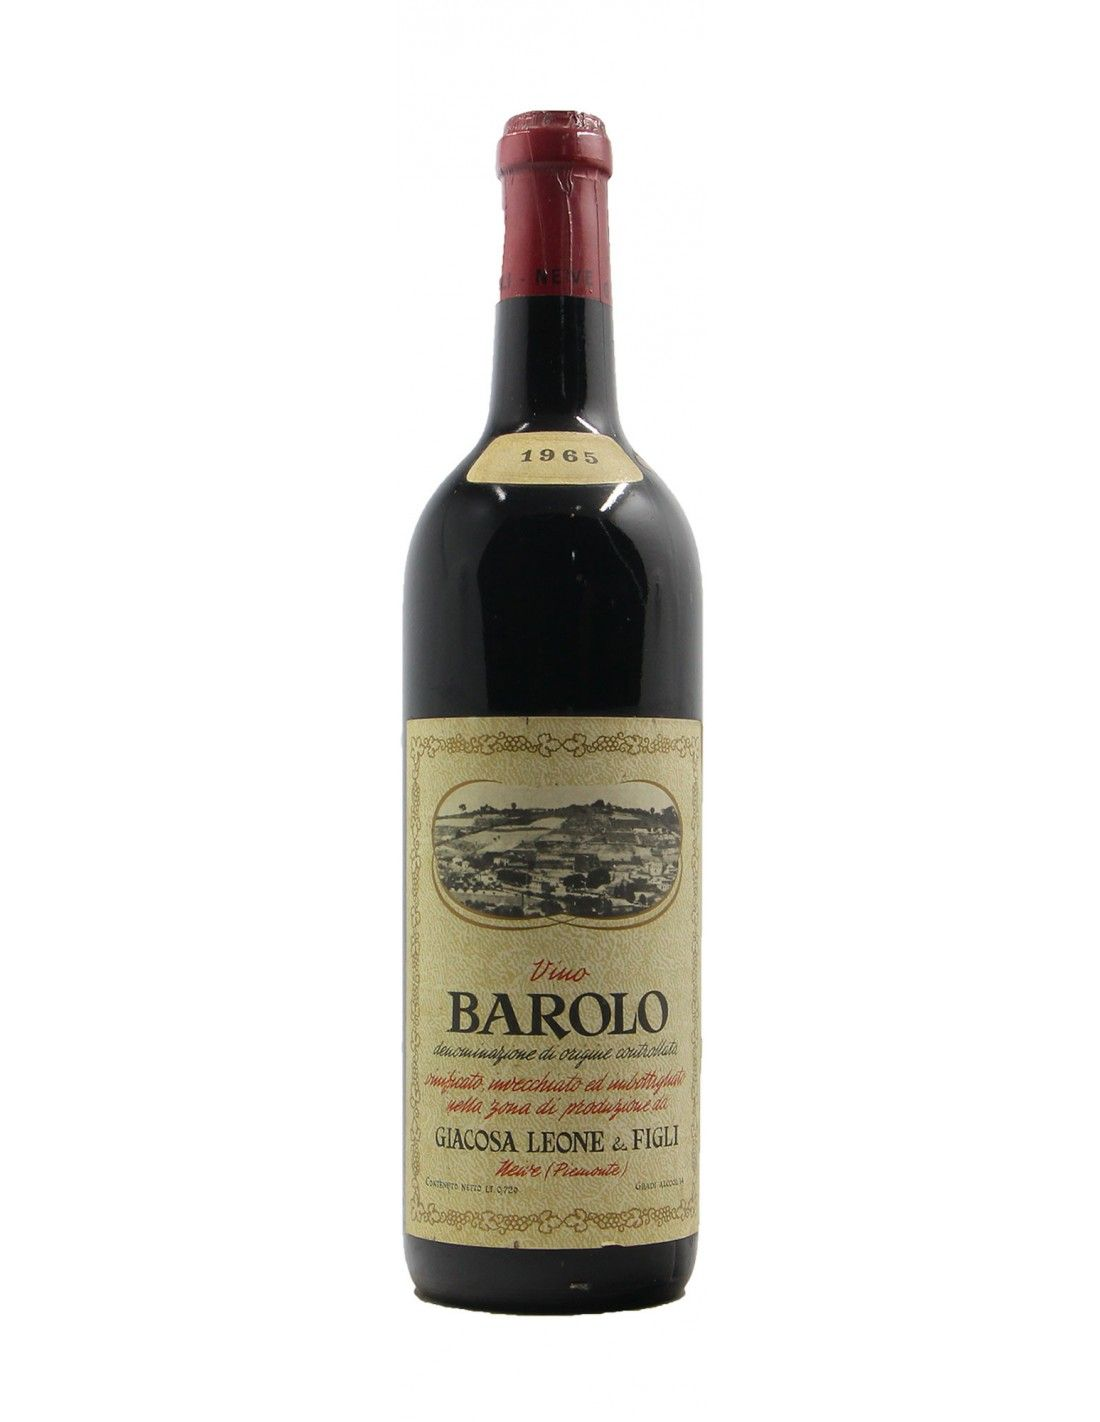 BAROLO 1965 GIACOSA LEONE Grandi Bottiglie